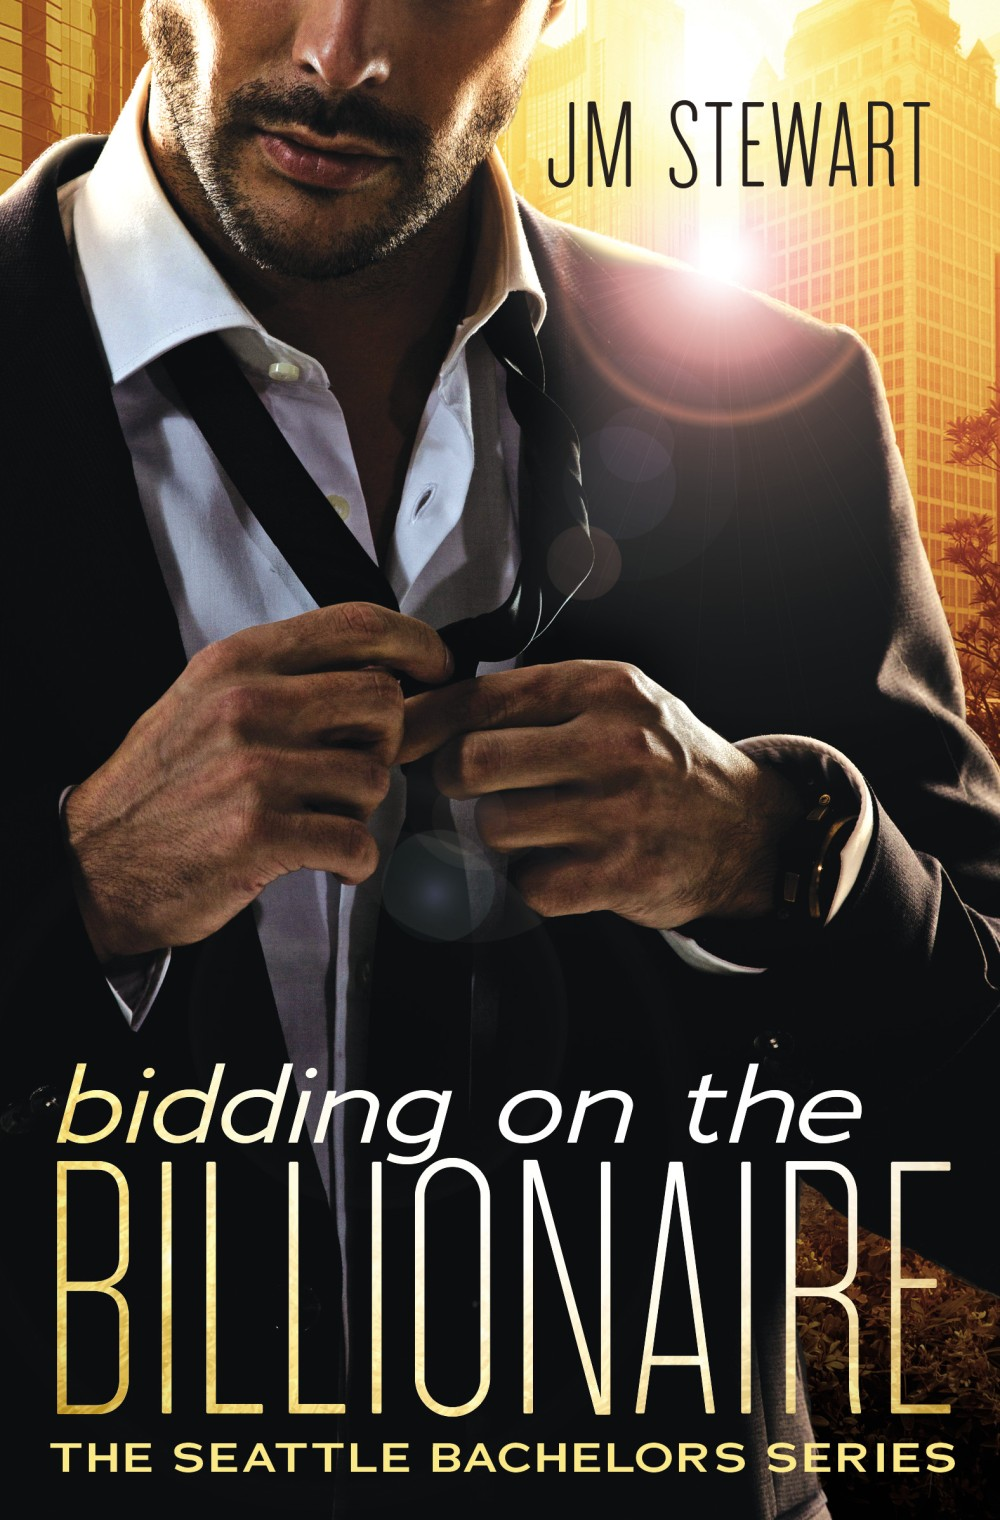 BiddingontheBillionaire_ebook